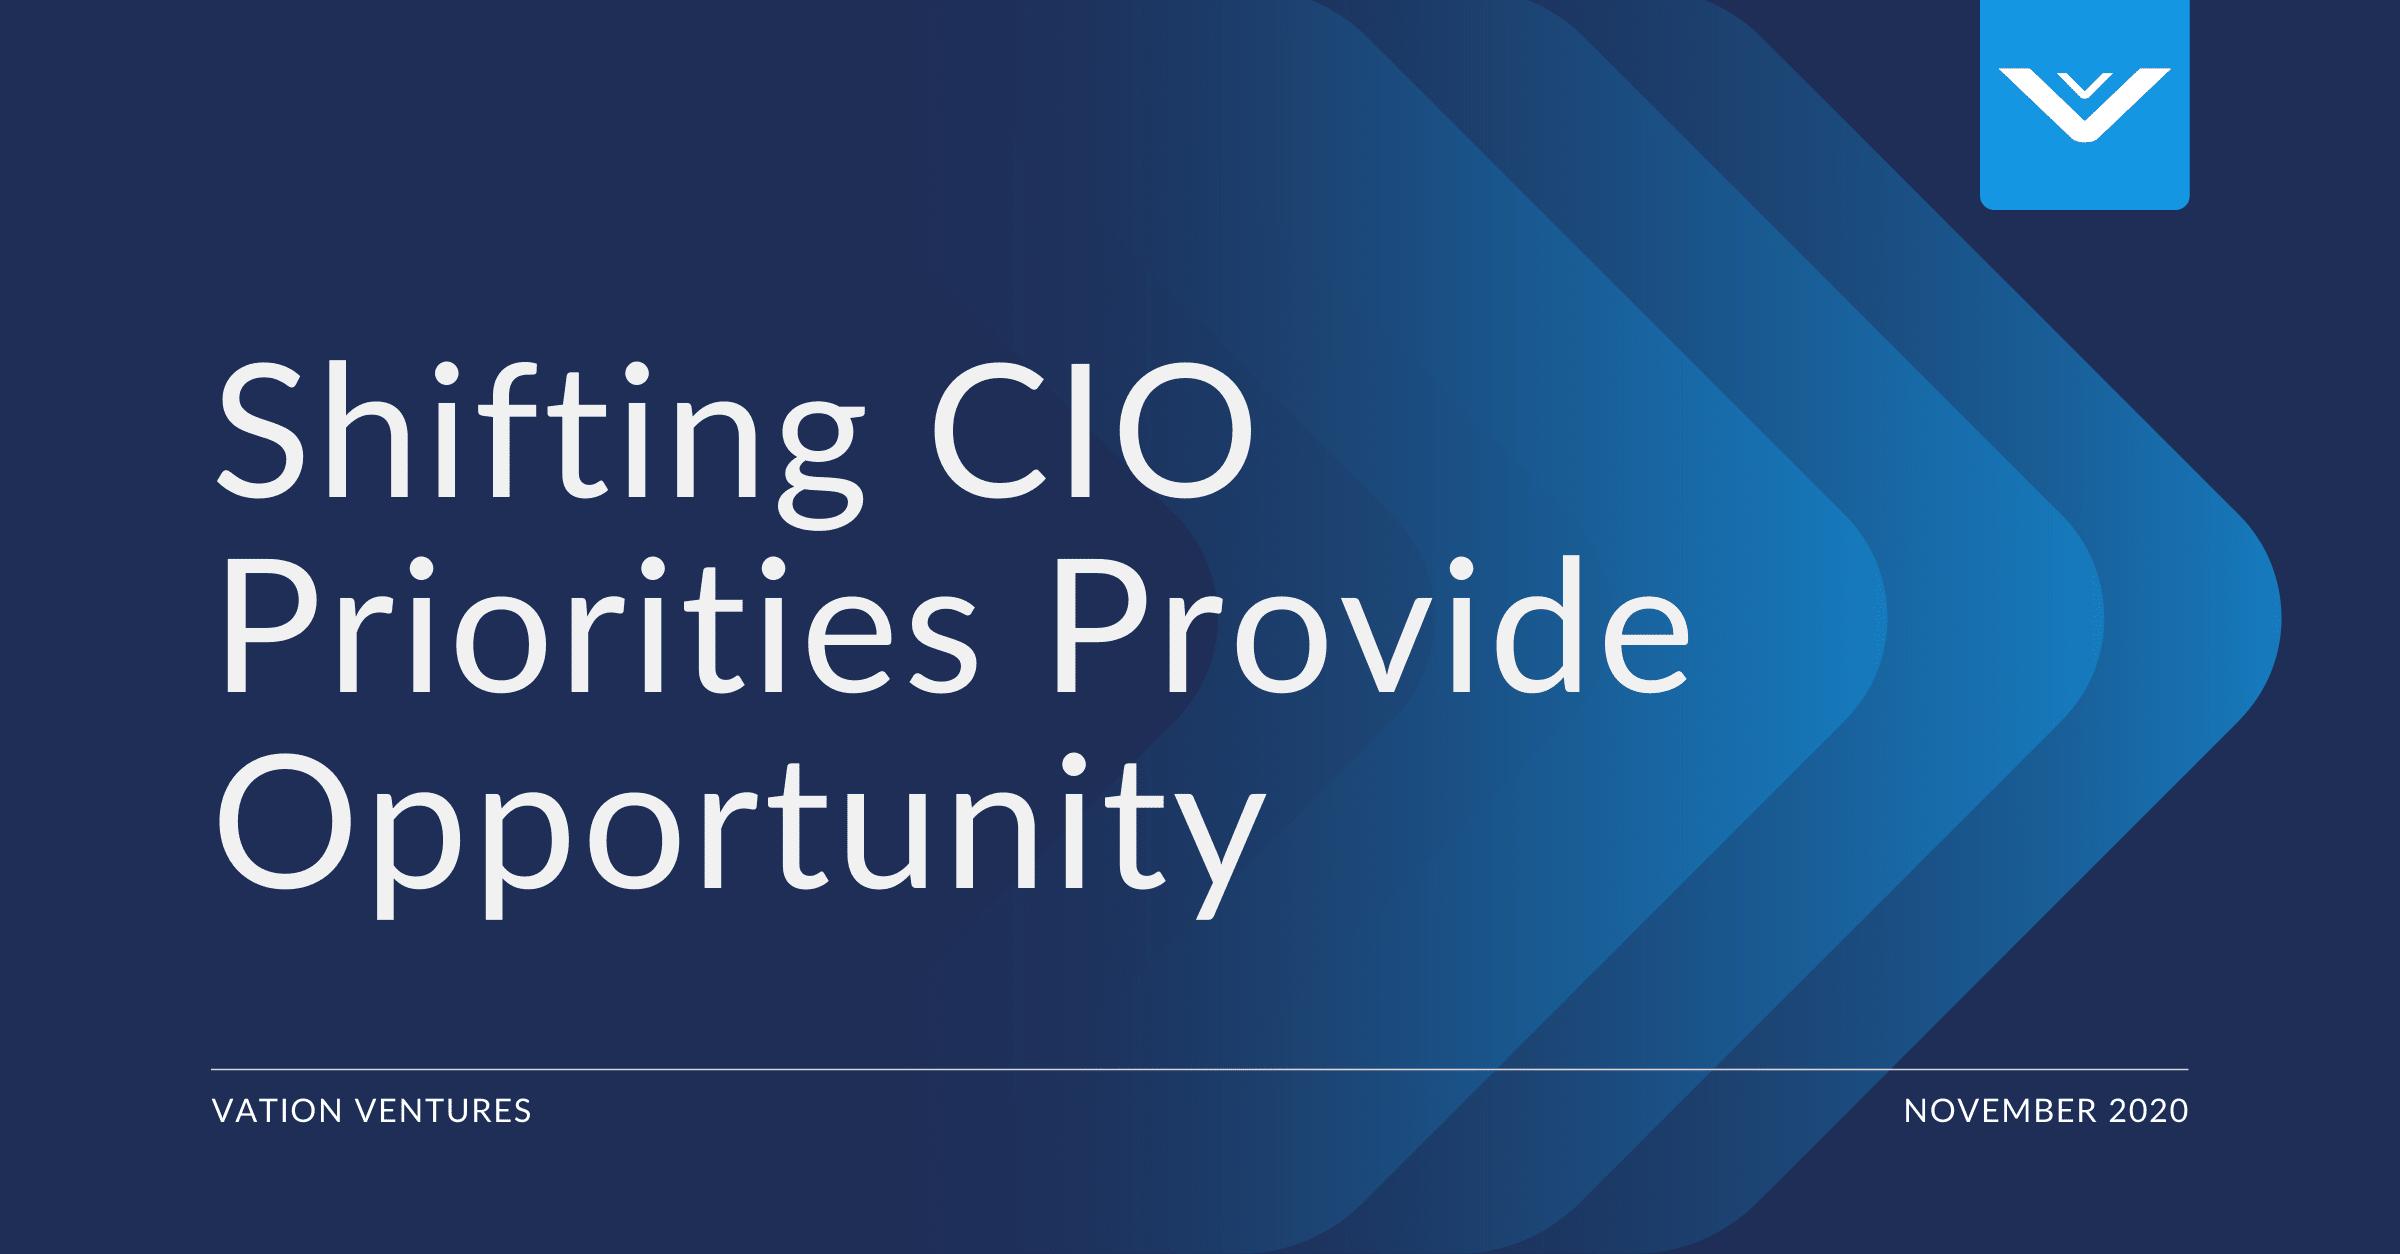 Shifting CIO Priorities Provide Opportunity